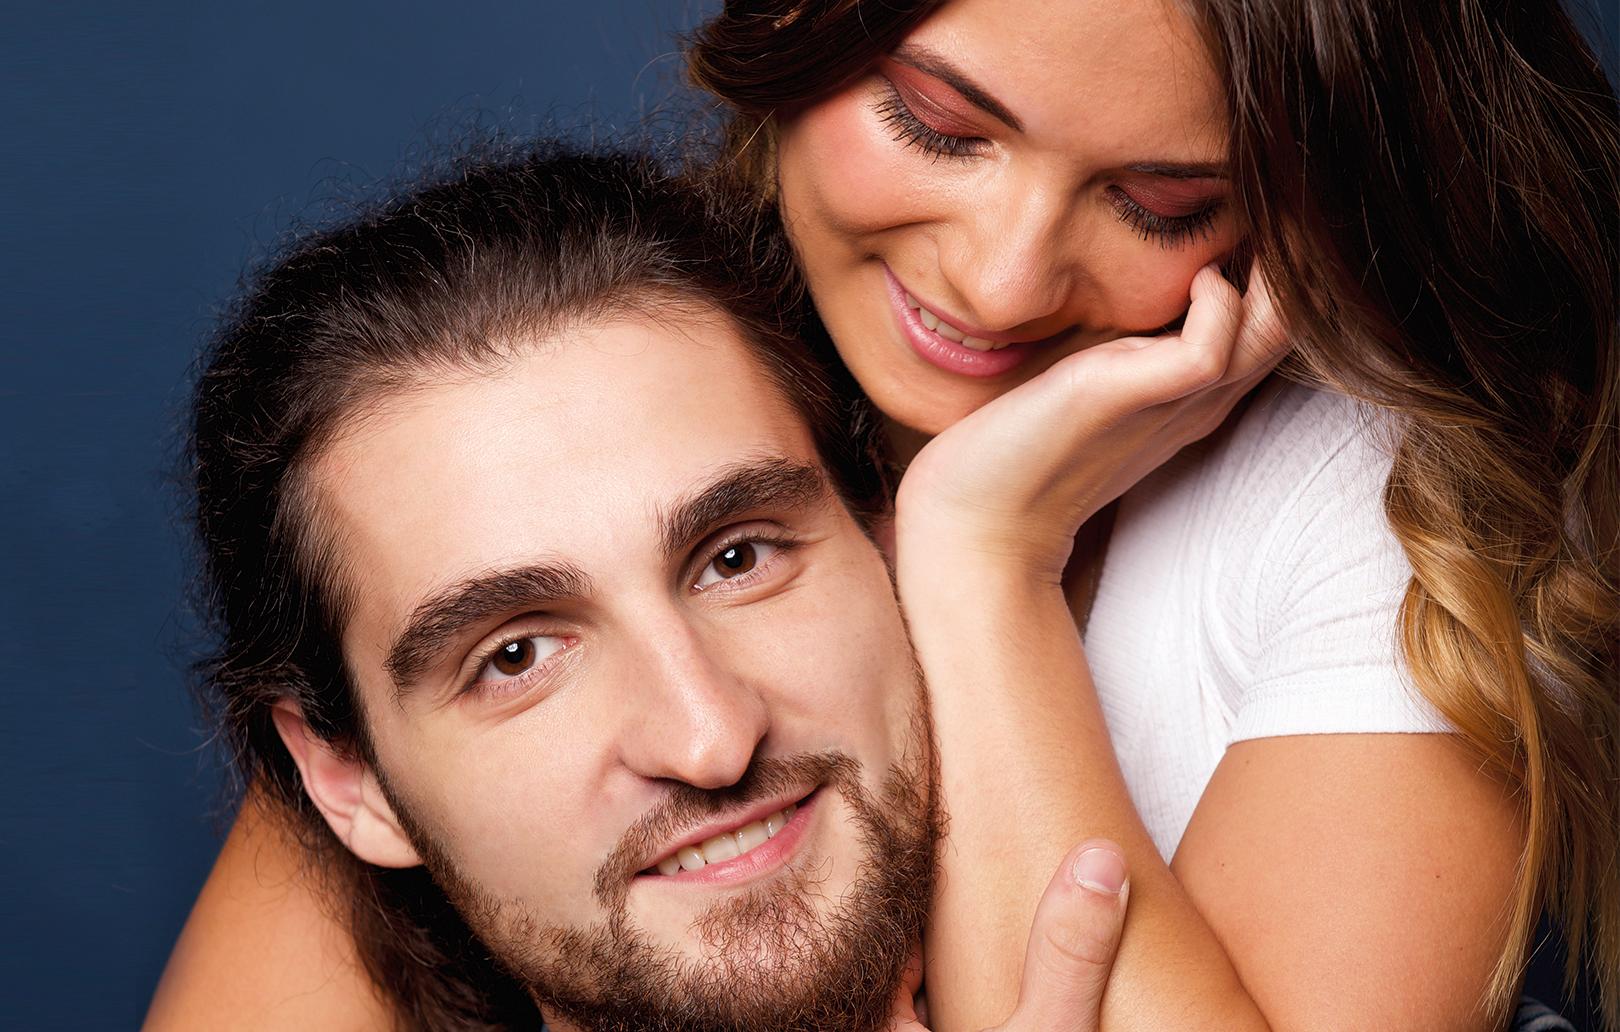 partner-fotoshooting-nuernberg-bg41618474572